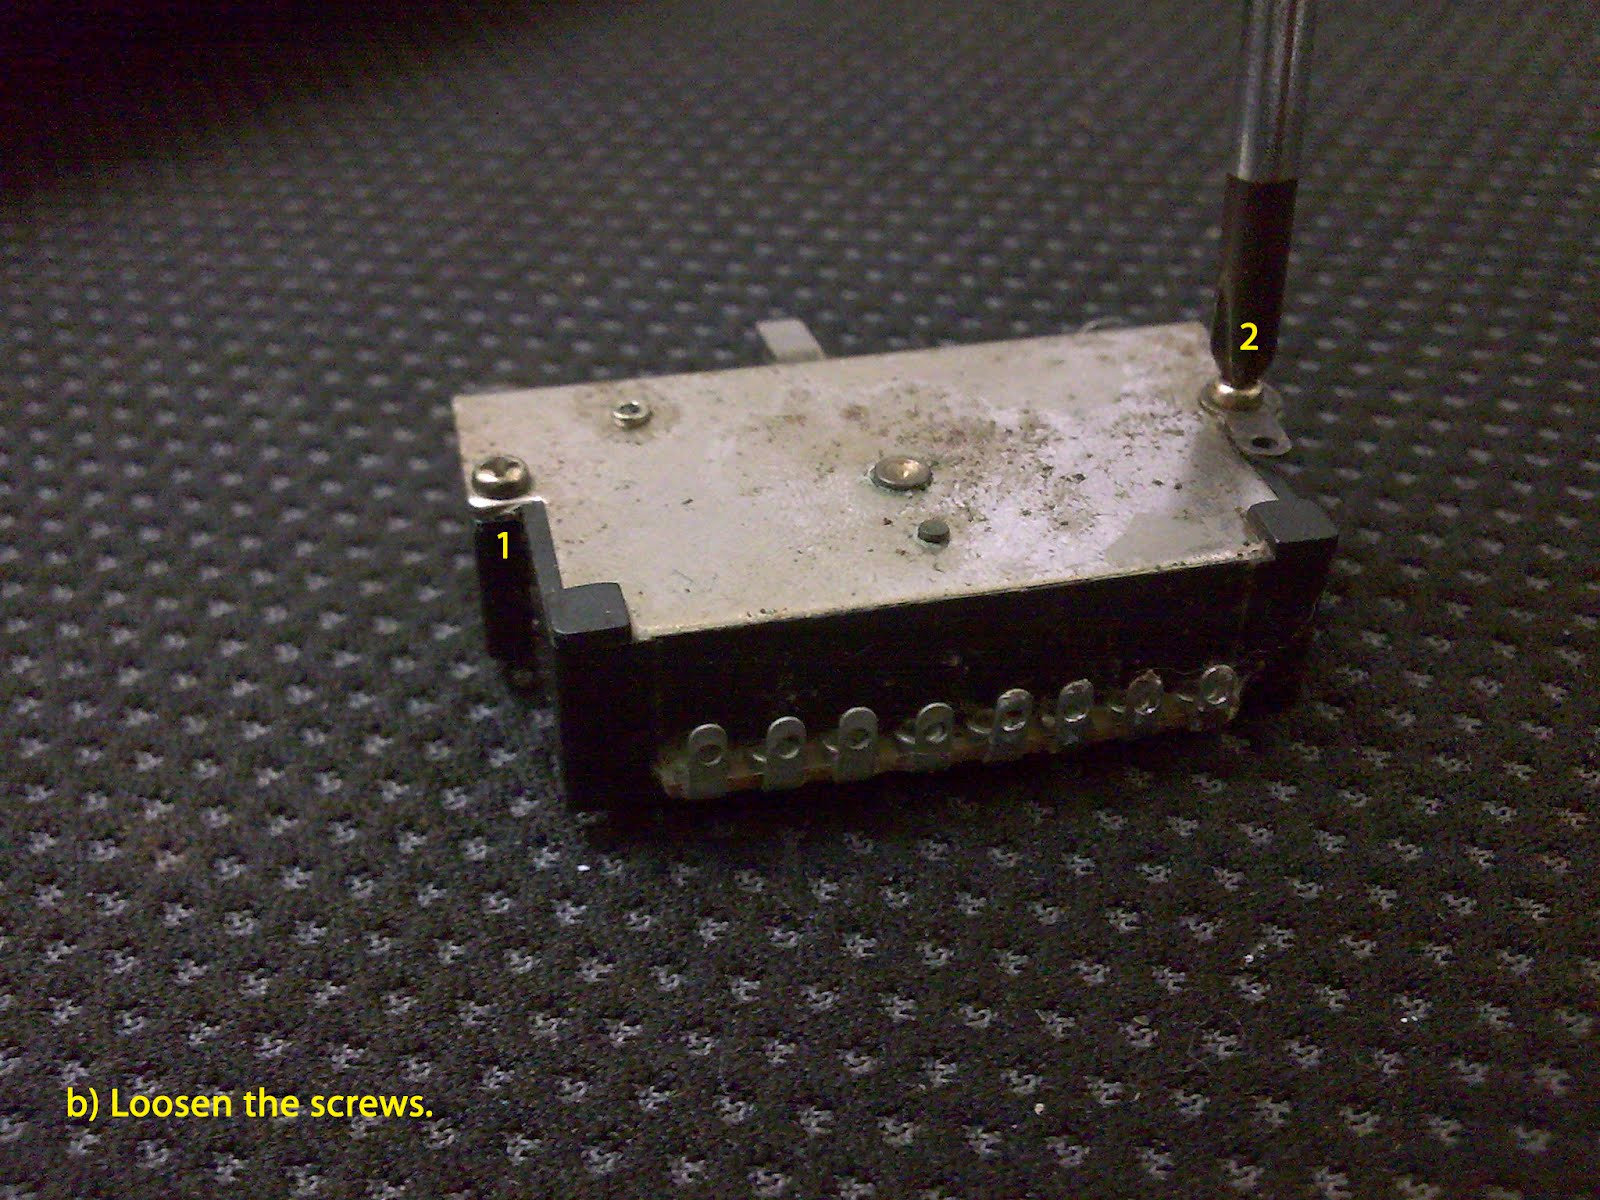 5 Way Switch Ym 50 Switches Explained Alloutputcom Membaiki Alatan Muzik Cleaning A Yamaha Ym50